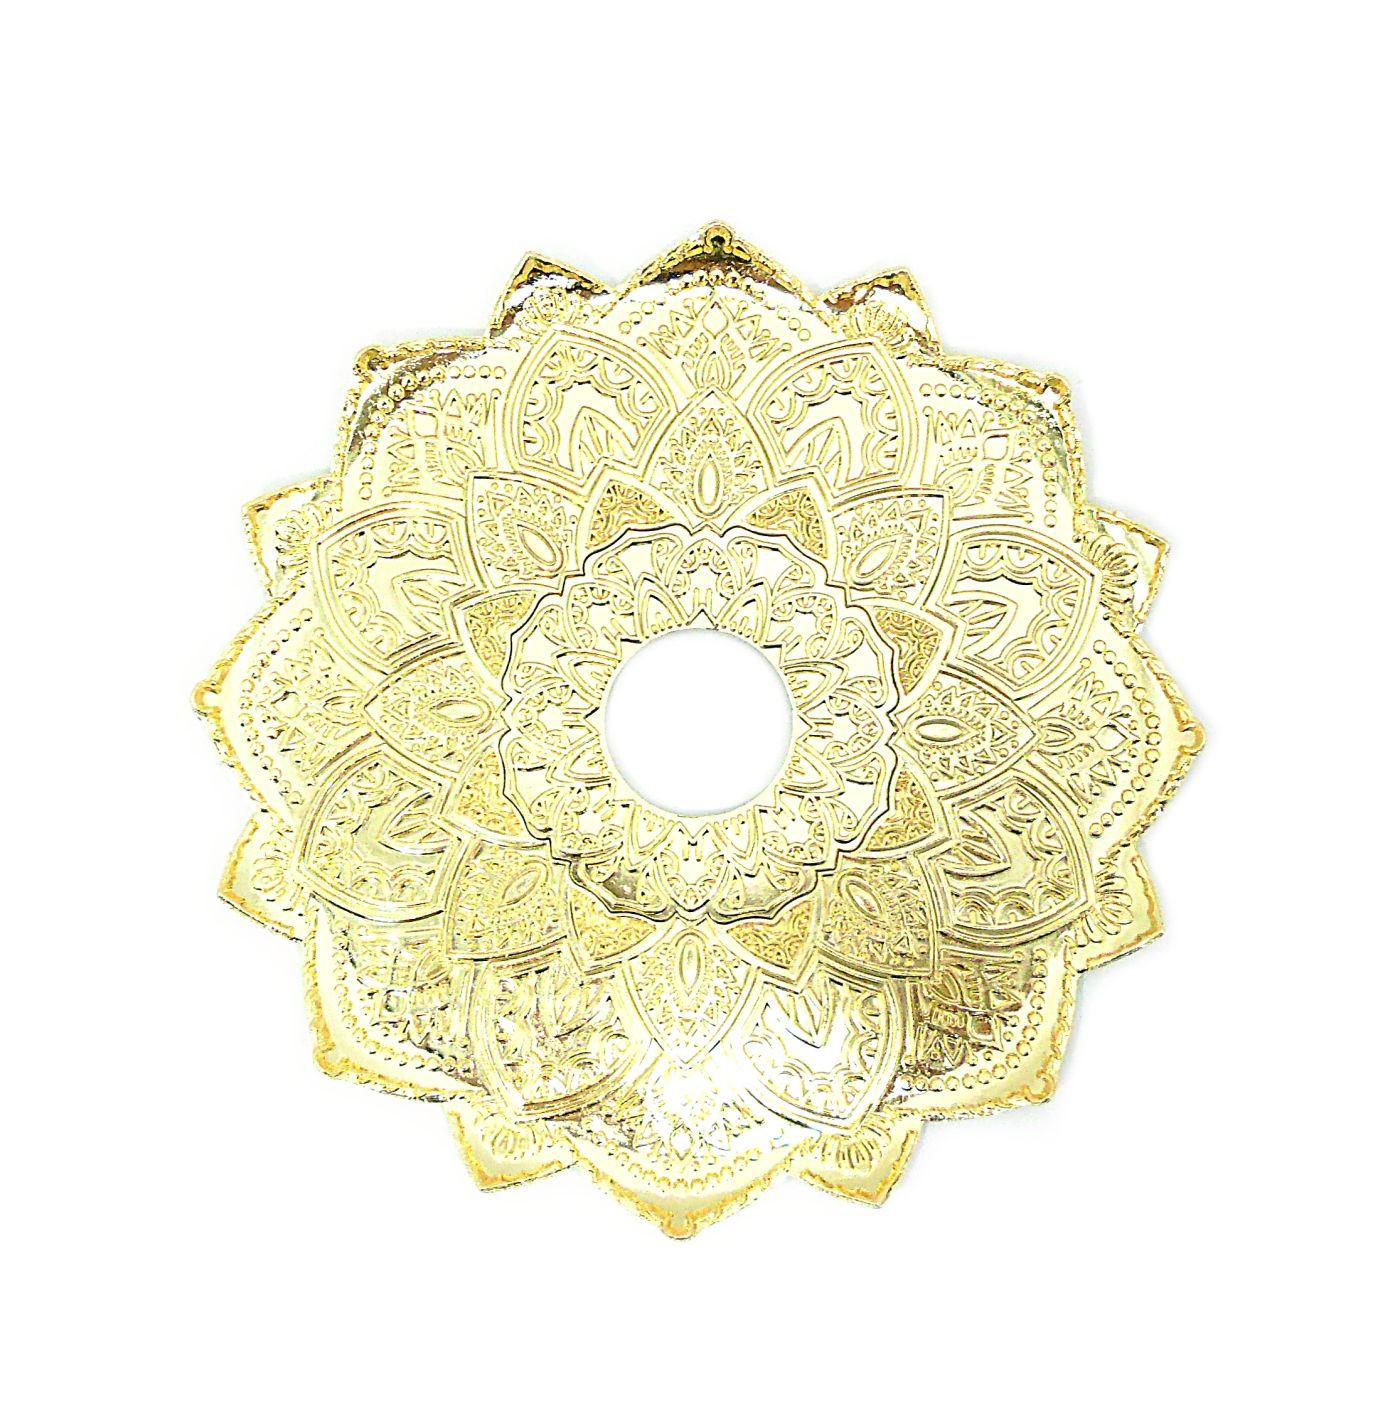 Narguile Mani Sultan Dourado 85cm, vaso Aladin, mang. silicone, piteira de alumínio, rosh Pro Hookah, prato Malik